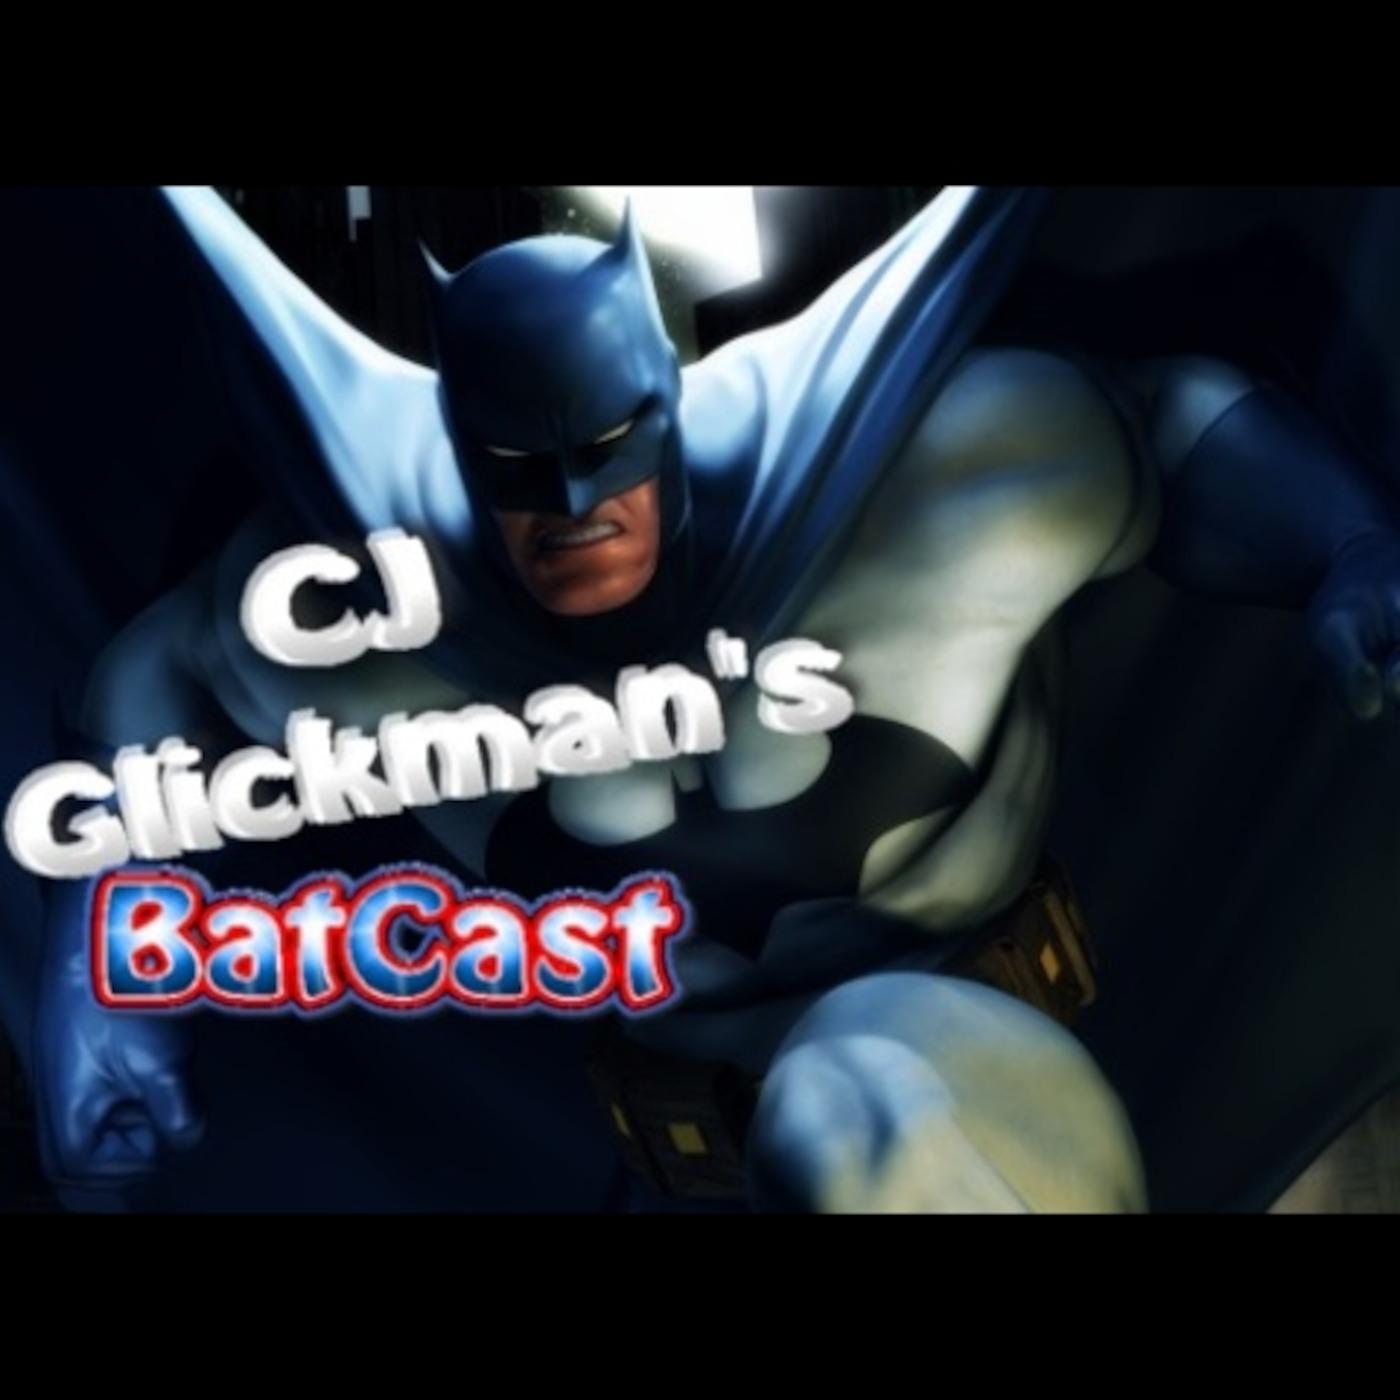 CJ Glickman's BatCast